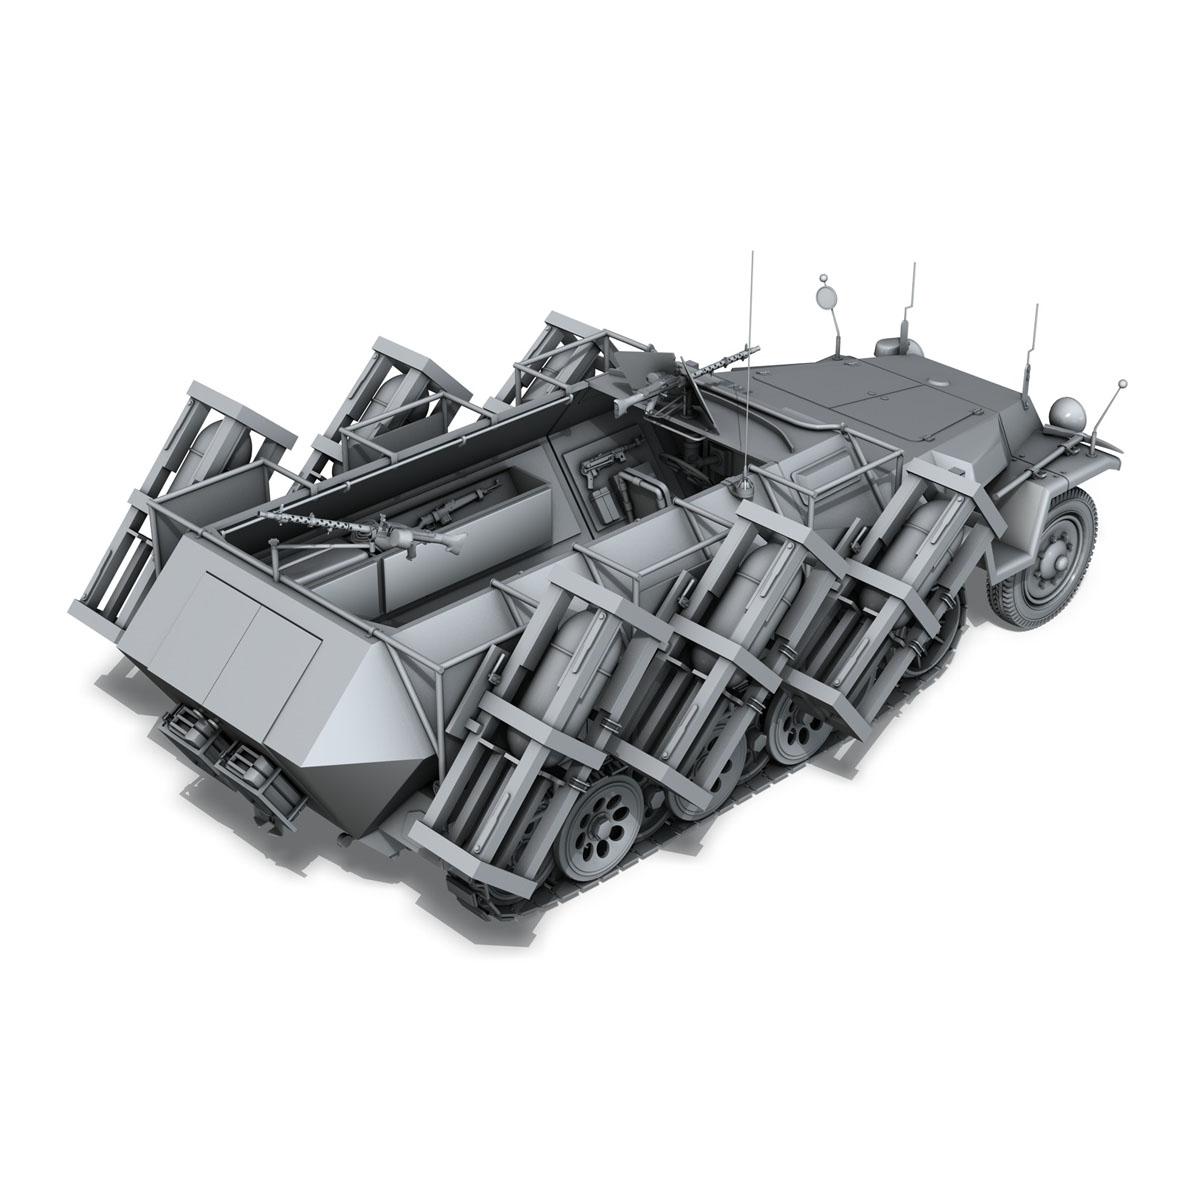 sd.kfz 251/1 ausf.c – walking stuka 3d model 3ds fbx c4d lwo obj 201241